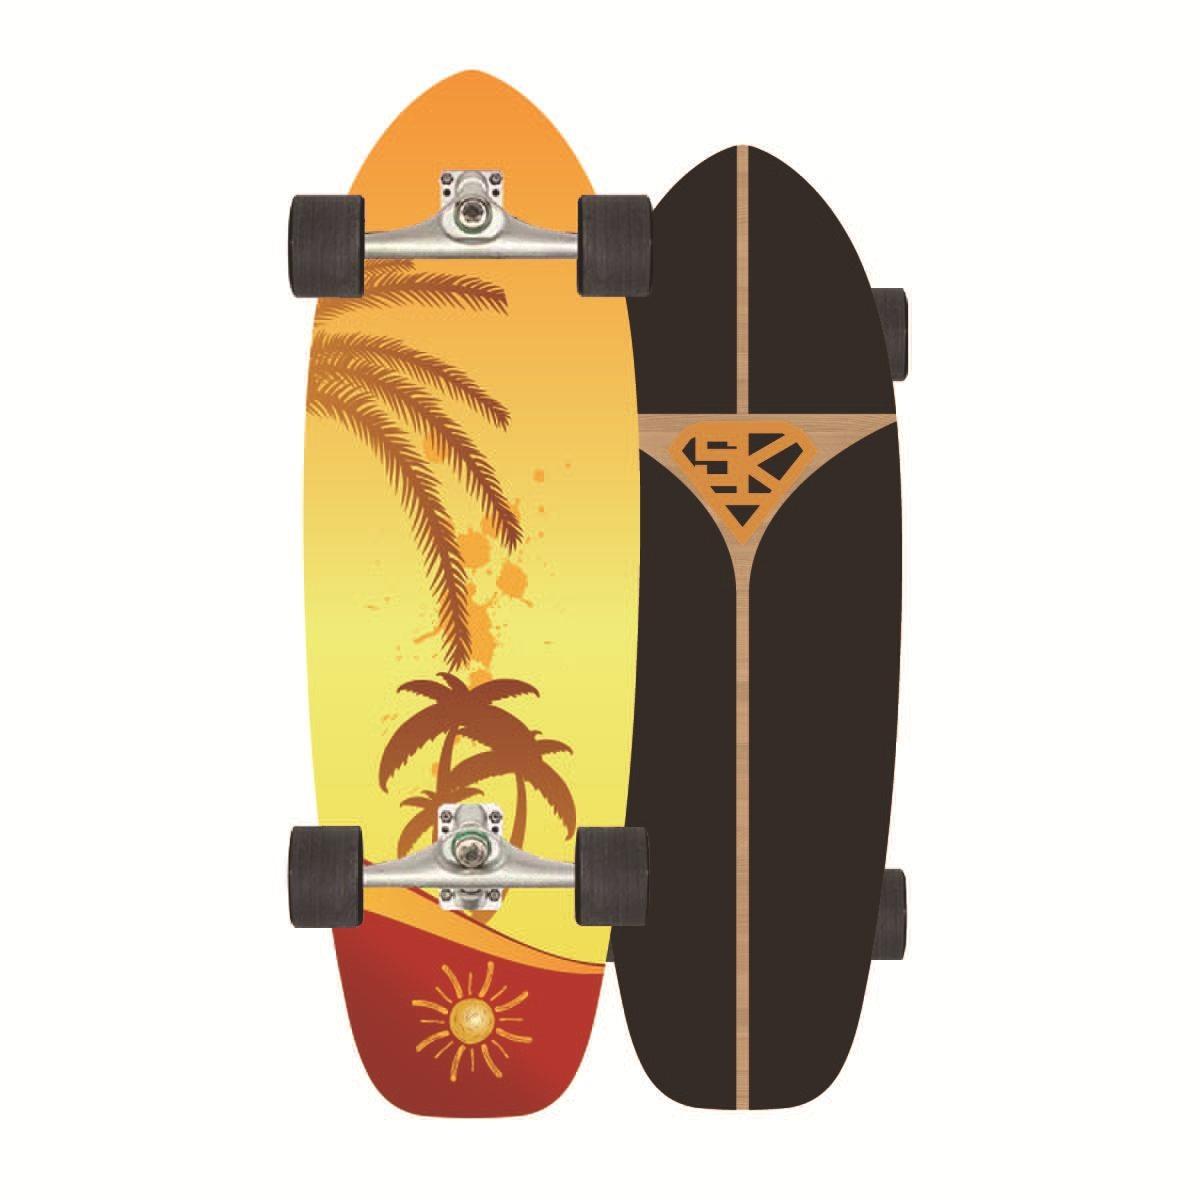 AddFun Land Surfboard Cruiser Skateboard Trucks Maple Wood All Crowds Four Wheels Skate Adult Board Decks Scooter All Terrain